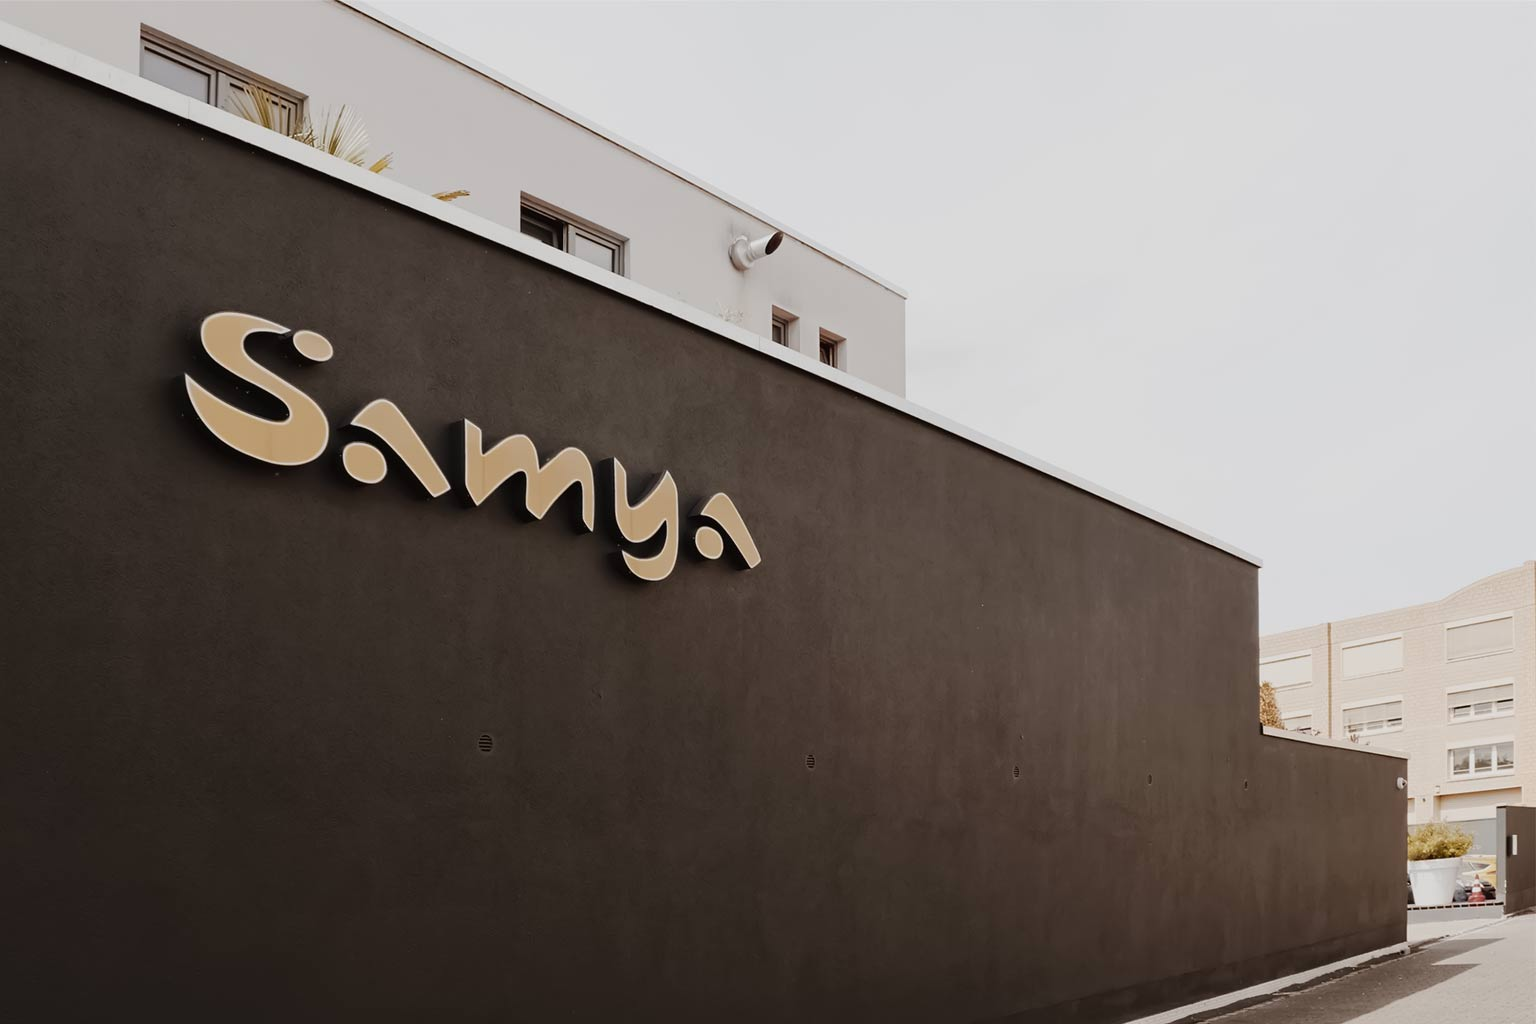 Samya FKK Club Köln - Description